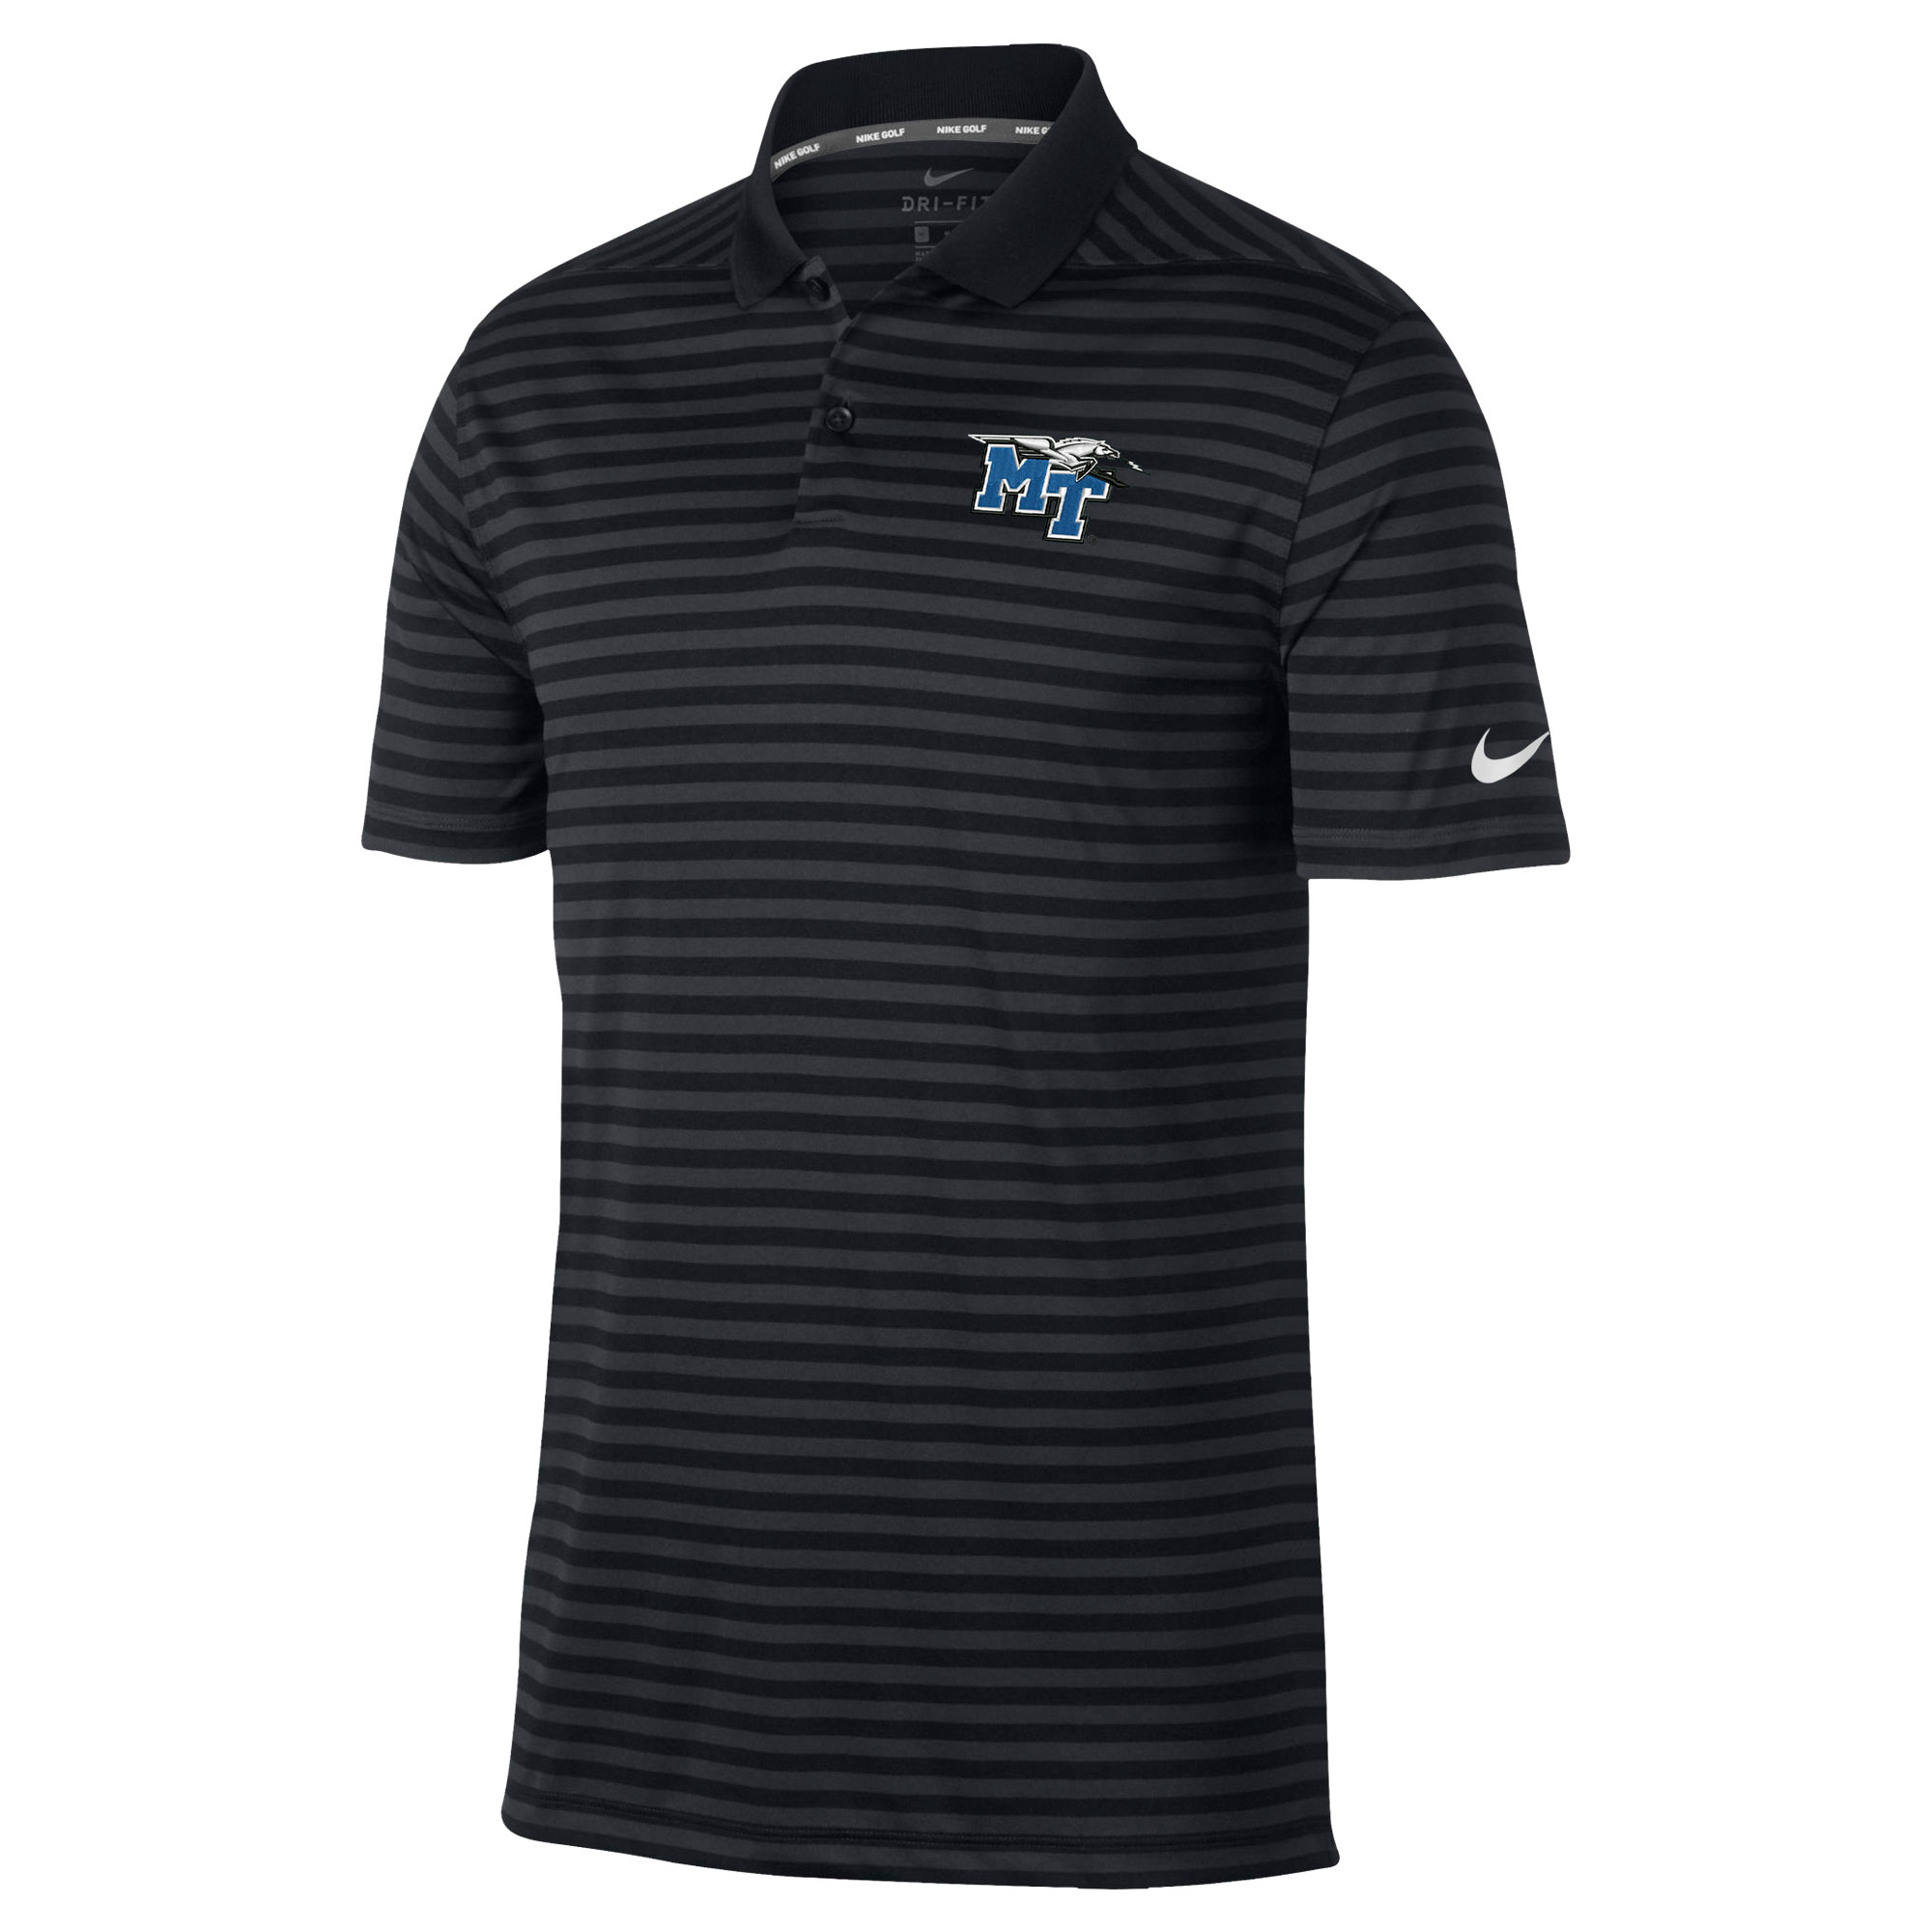 MT Logo w/ Lightning Victory Stripe 2.0 Nike® Polo